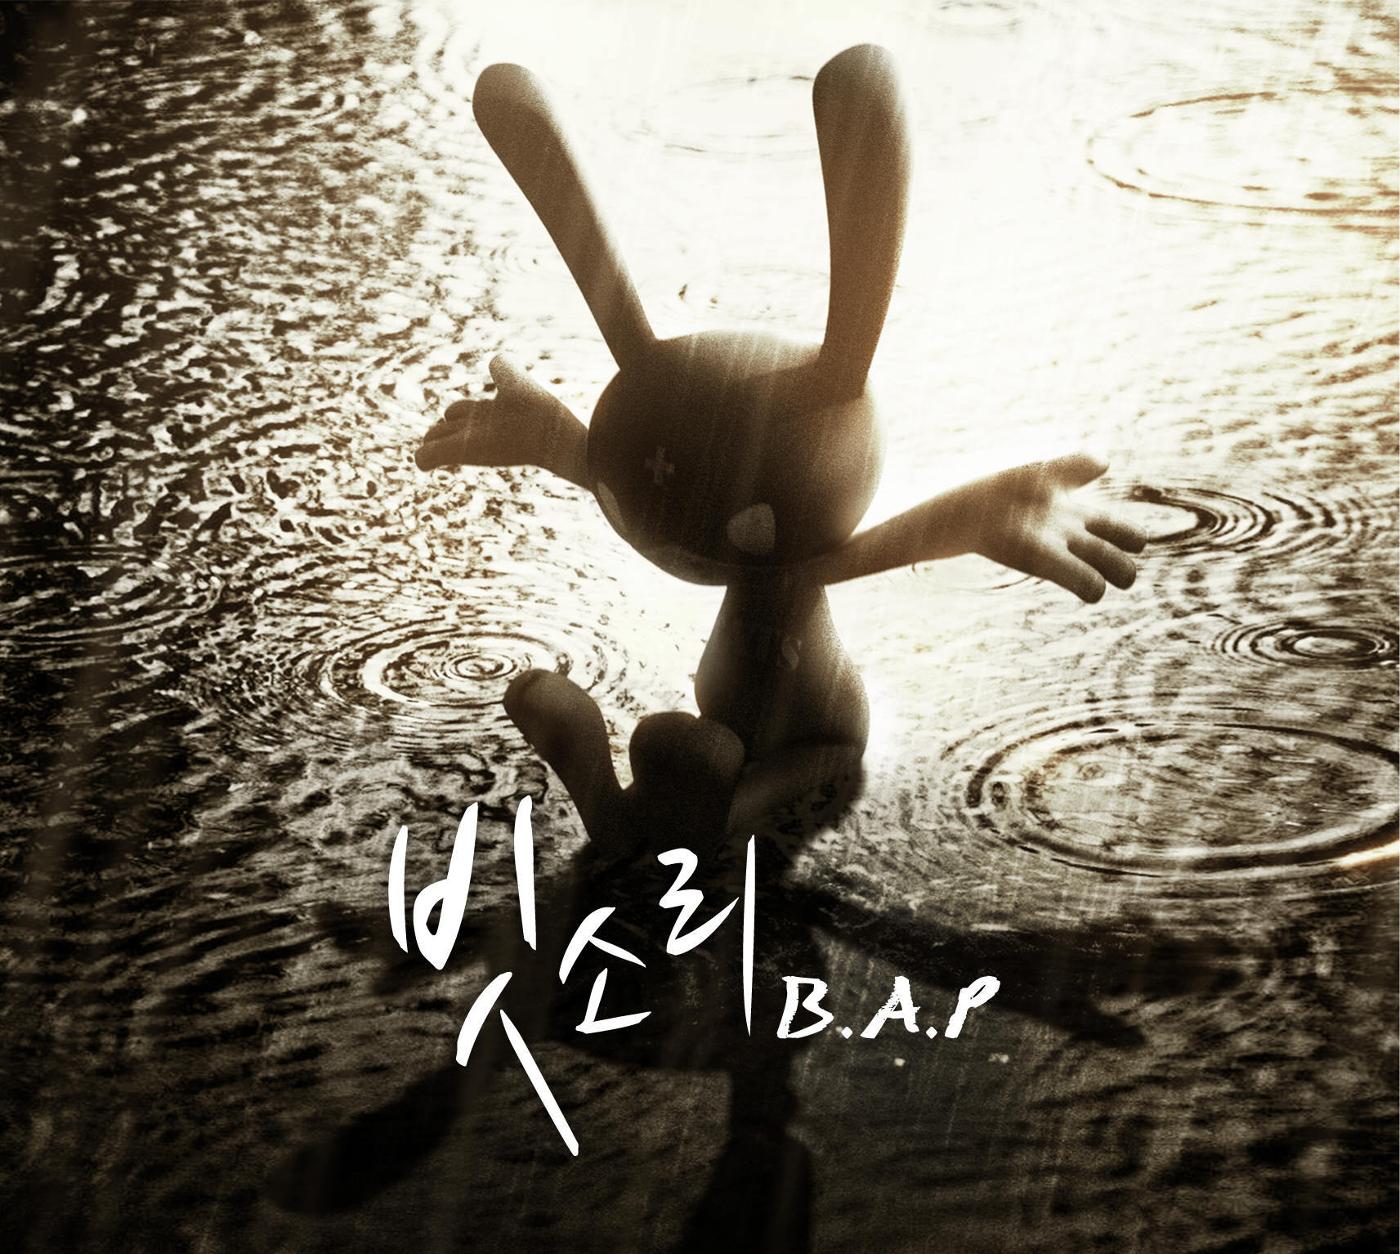 Rain Sound (B.A.P)